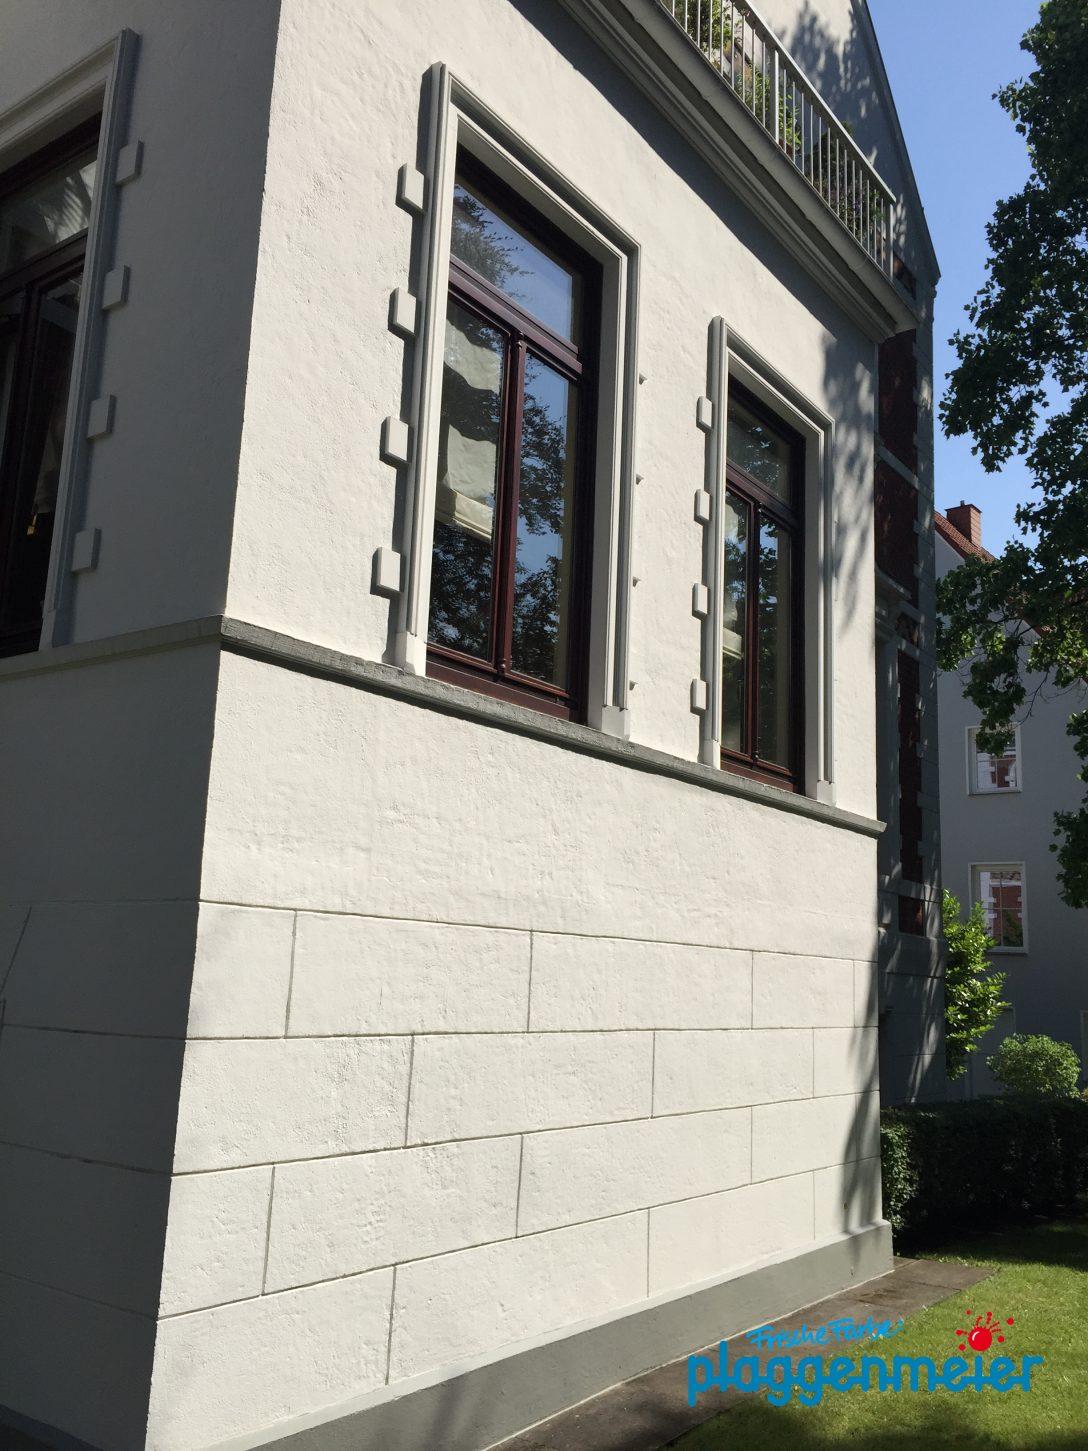 Large Size of Fenster Bremen Maler Plaggenmeier042 Arno Plaggenmeier Gmbh Holz Alu Preise Online Konfigurieren Sonnenschutz Rollo Konfigurator Velux Aluplast Fenster Fenster Bremen